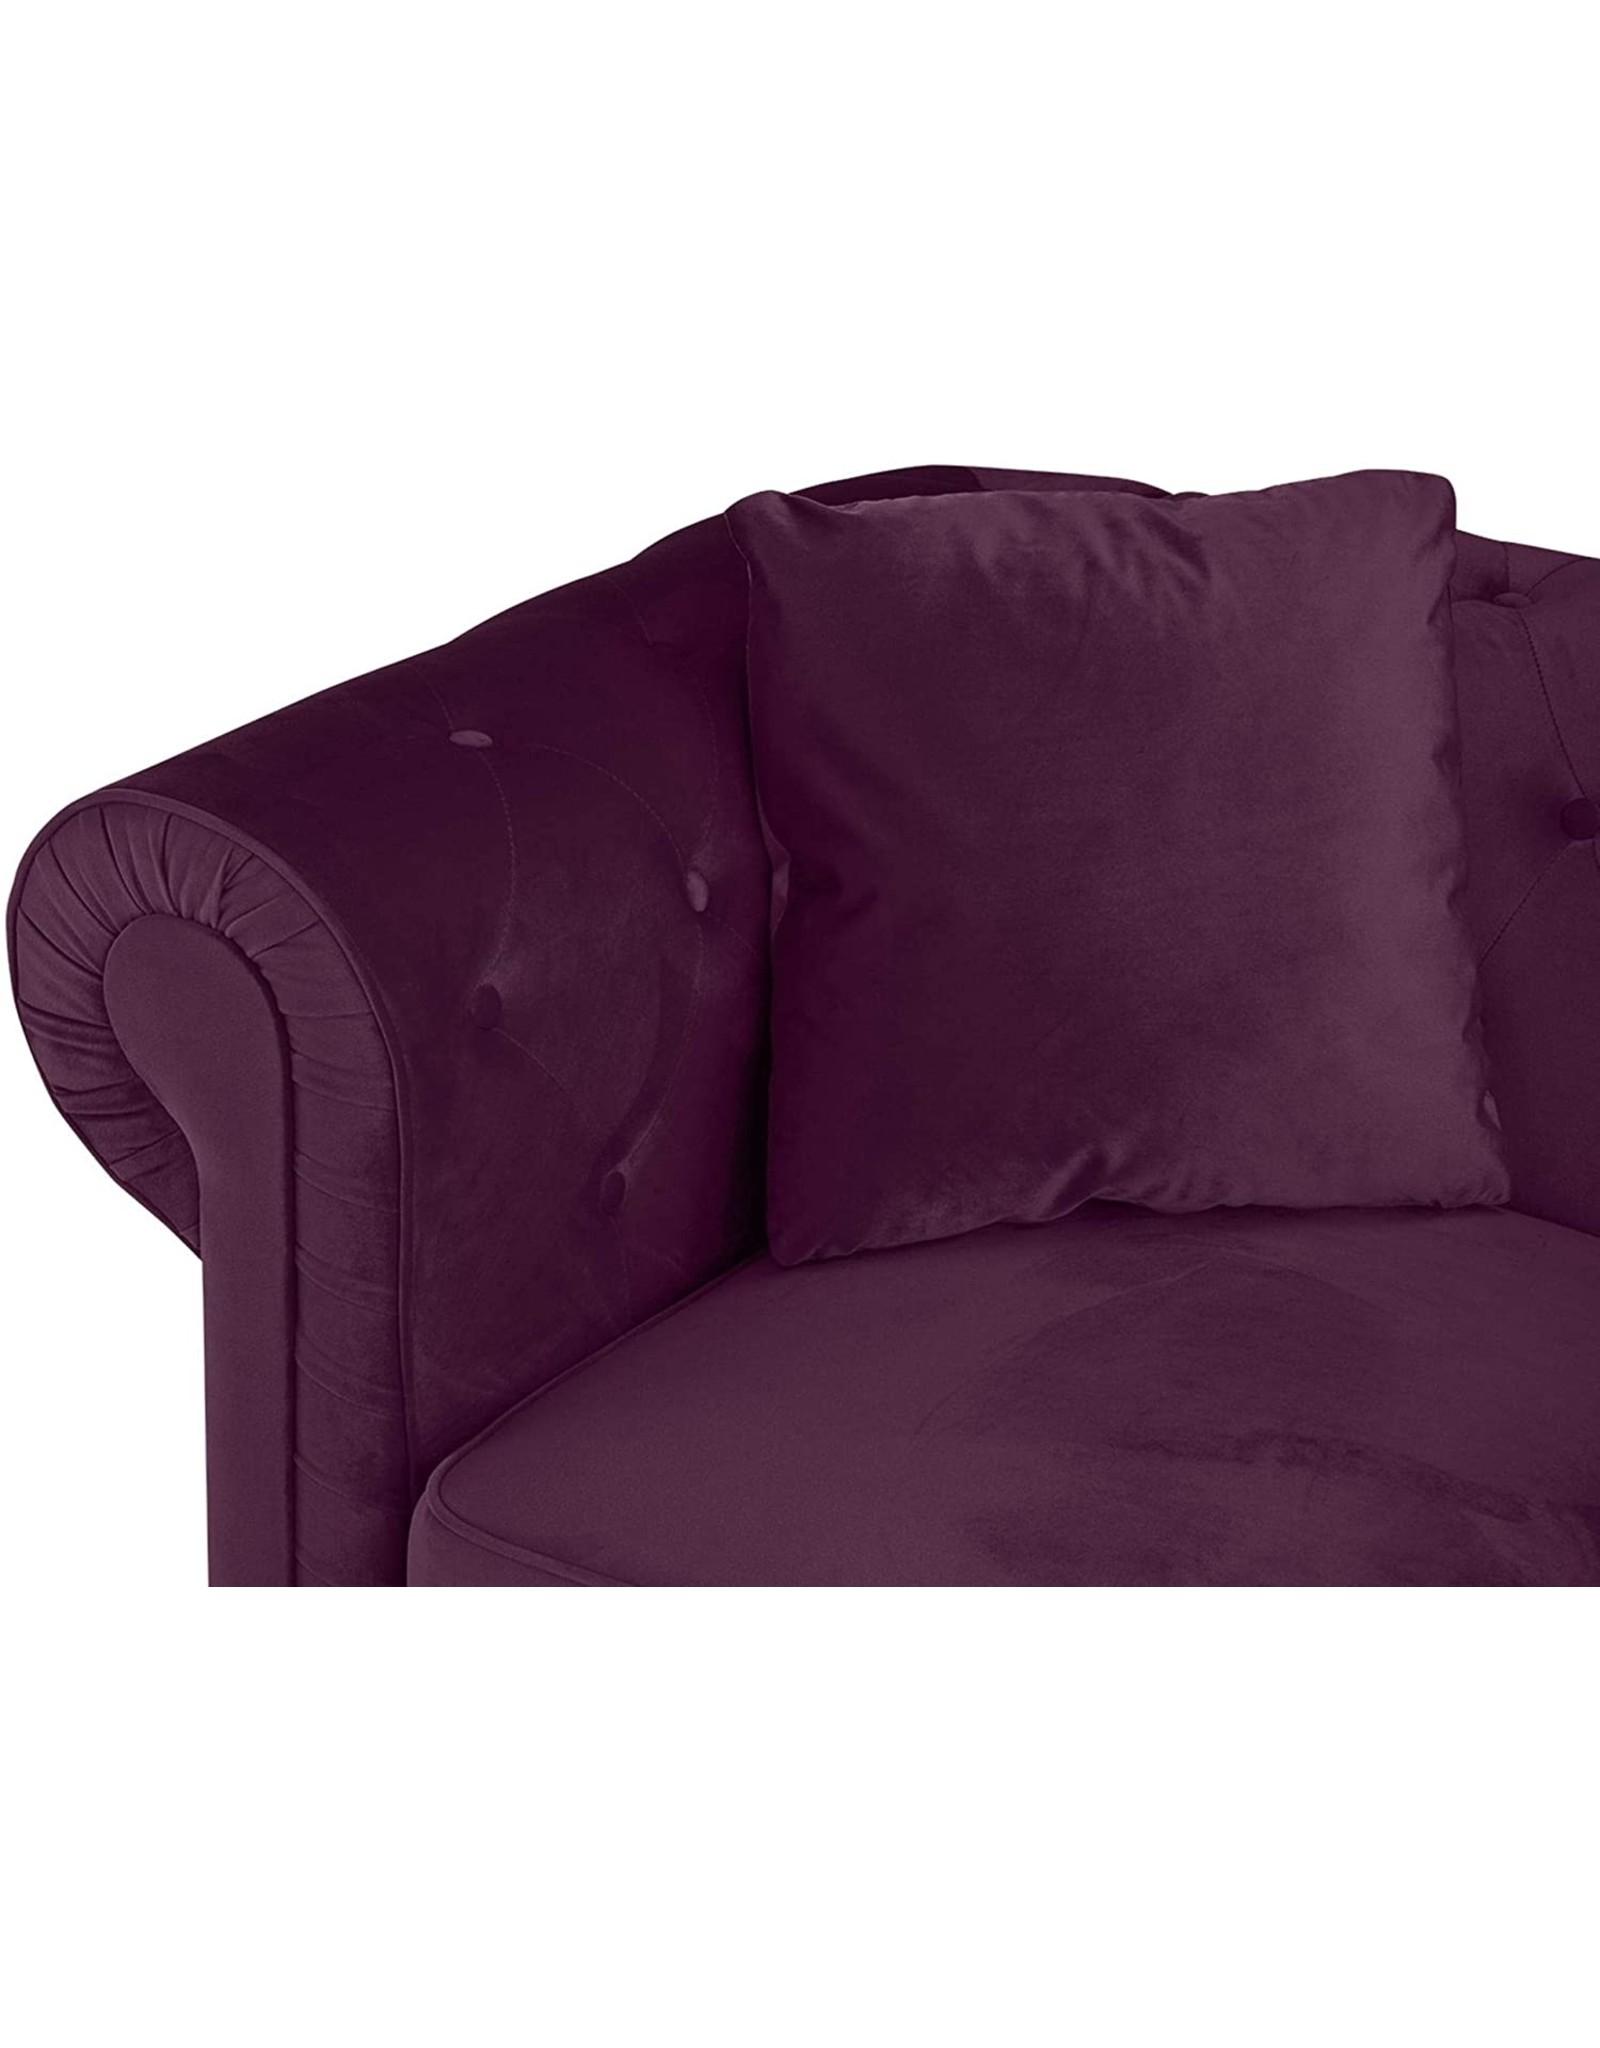 Casa Andrea Milano Casa Andrea Milano llc Classic Velvet Scroll Arm Tufted Button Chesterfield Sofa (Grey), Large, Purple